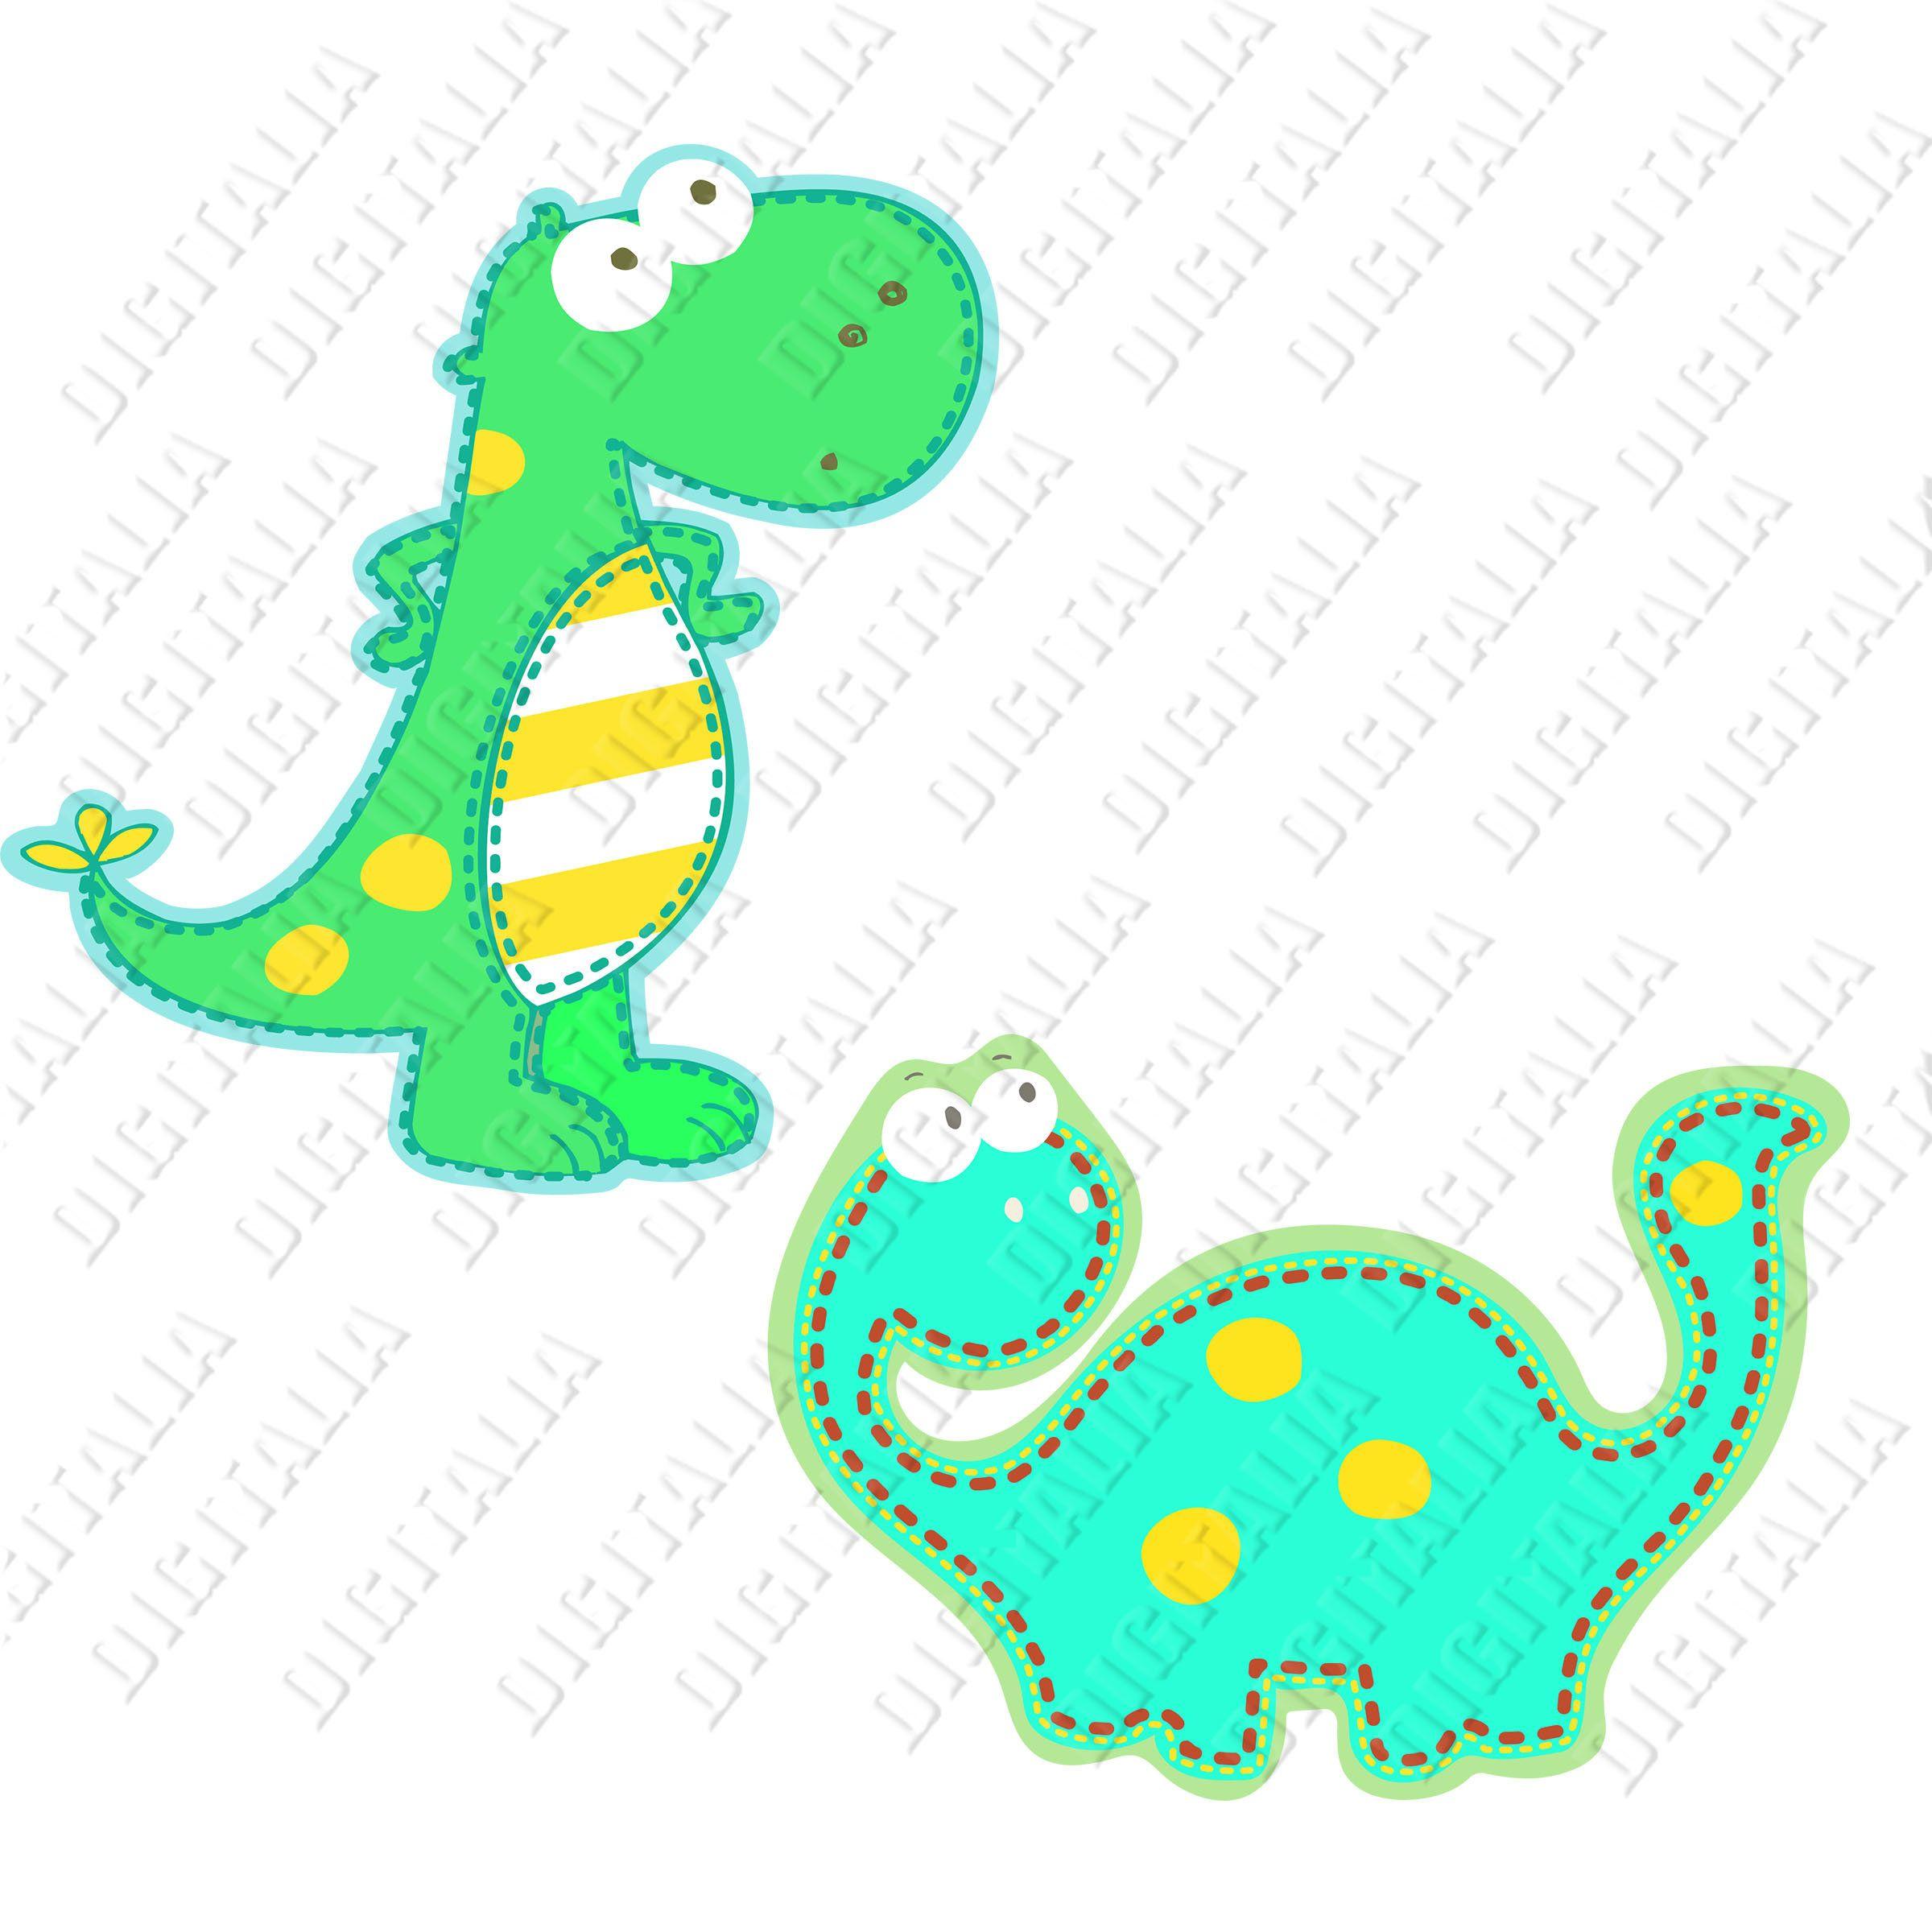 Cute Dinosaur Clipart Dinosaur Svg Jpeg Png With Transparent